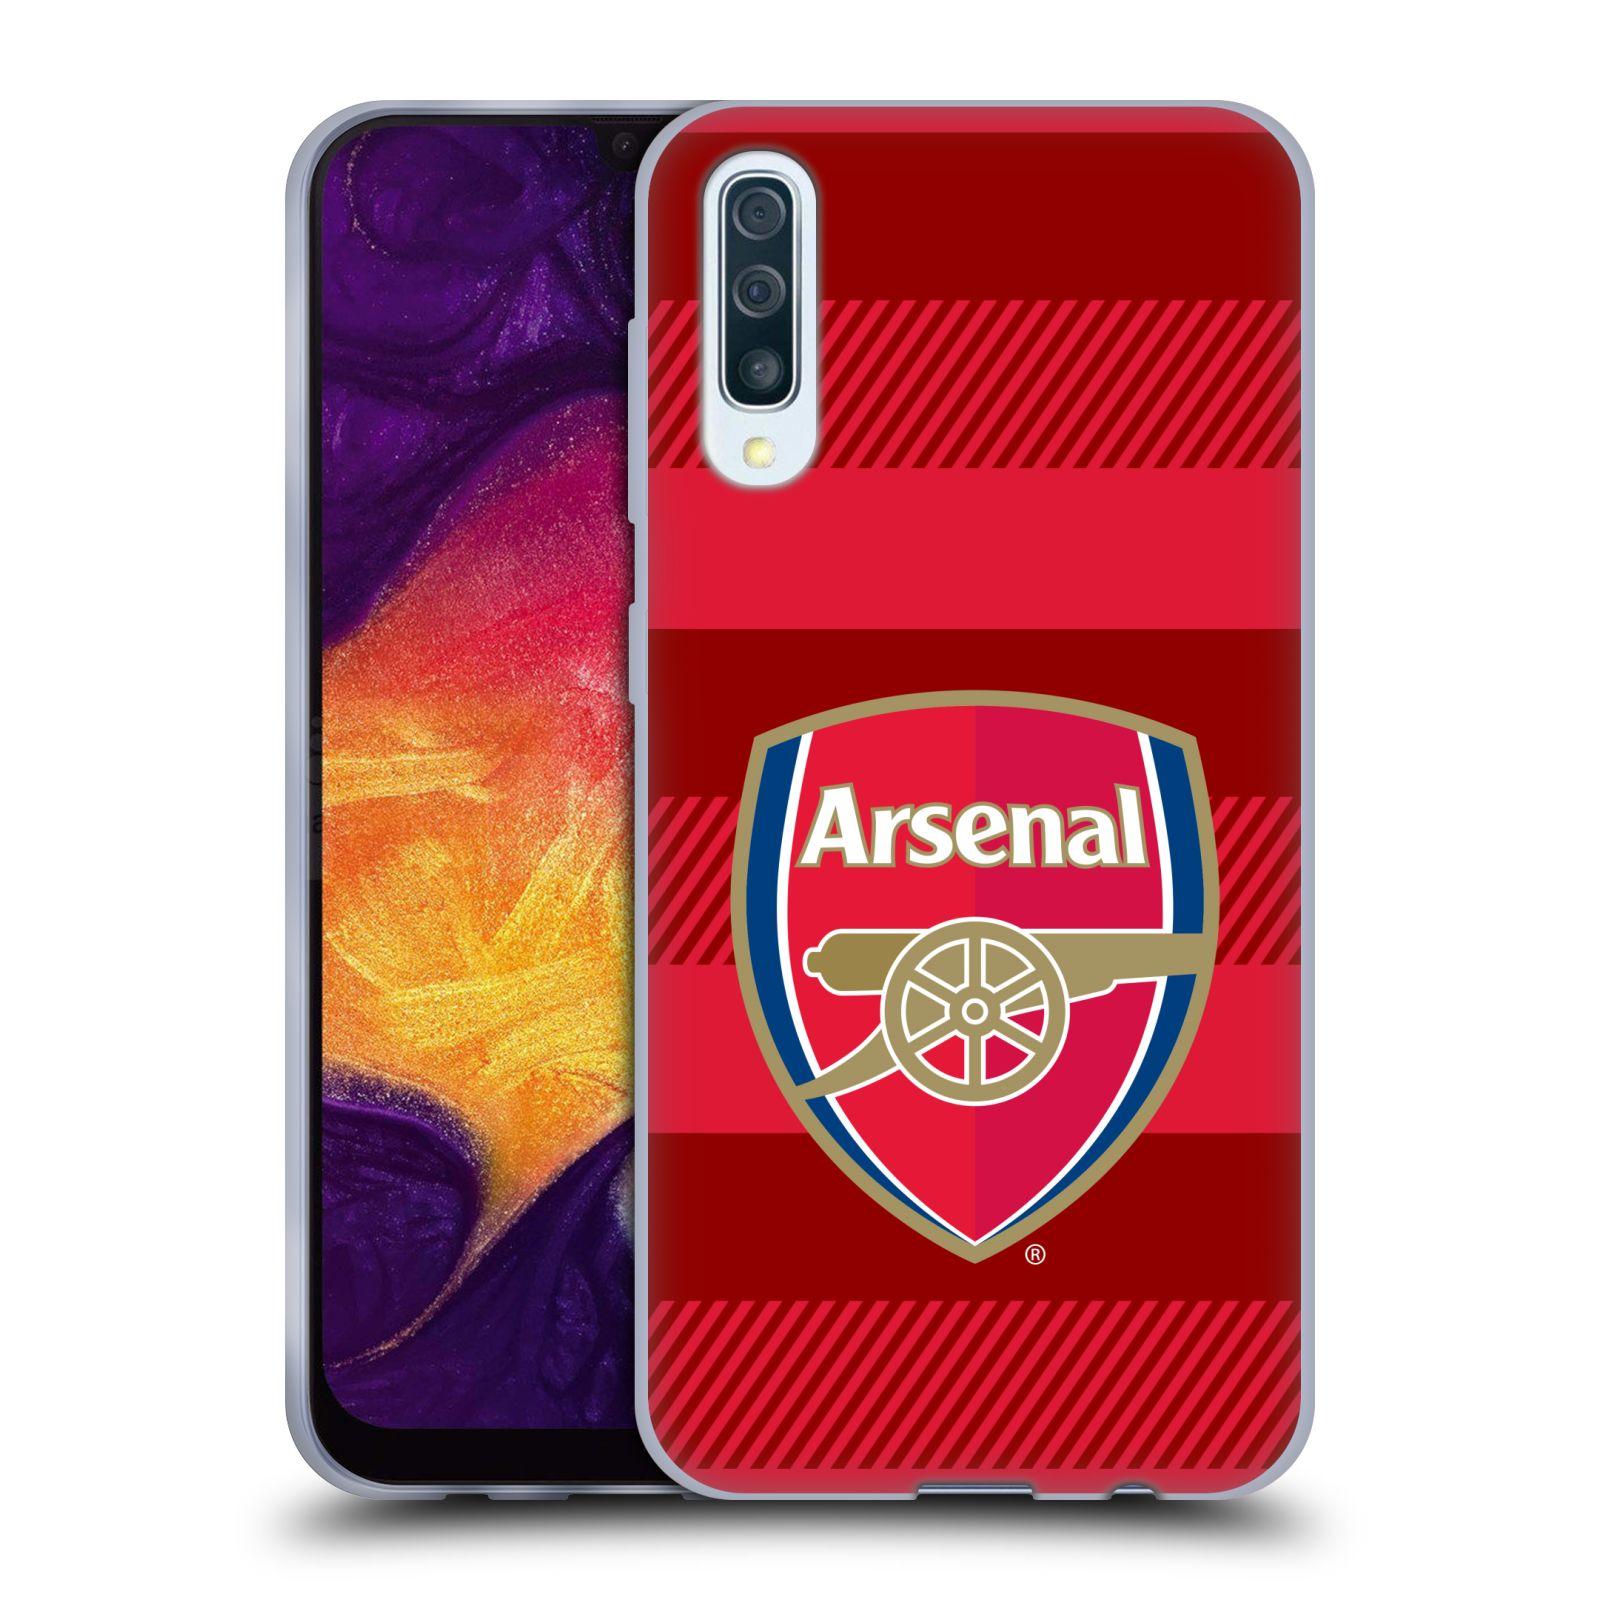 Silikonové pouzdro na mobil Samsung Galaxy A50 / A30s - Head Case - Arsenal FC - Logo s pruhy